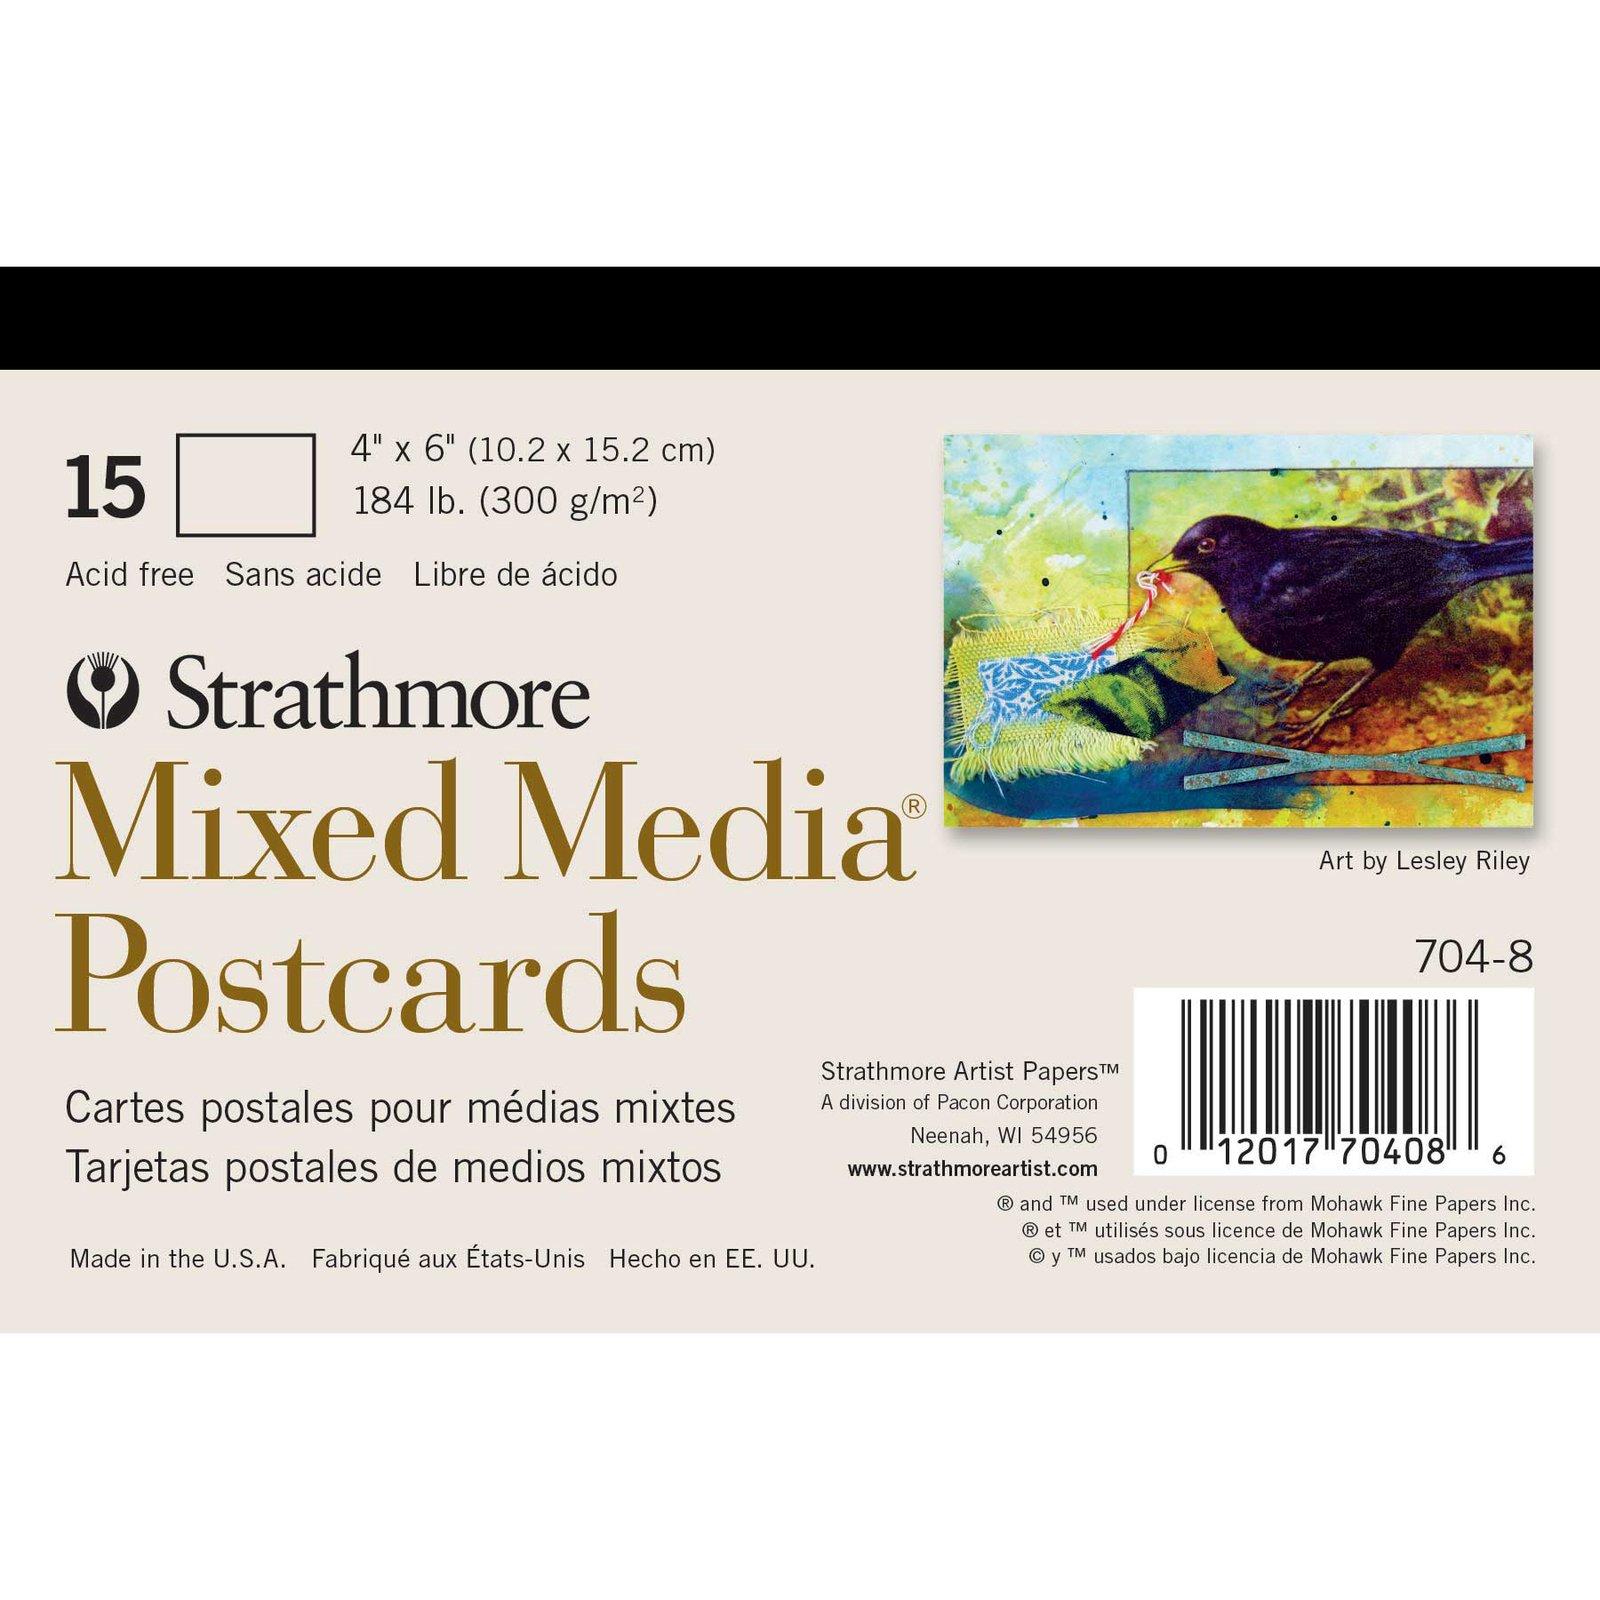 Mixed Media Postcards